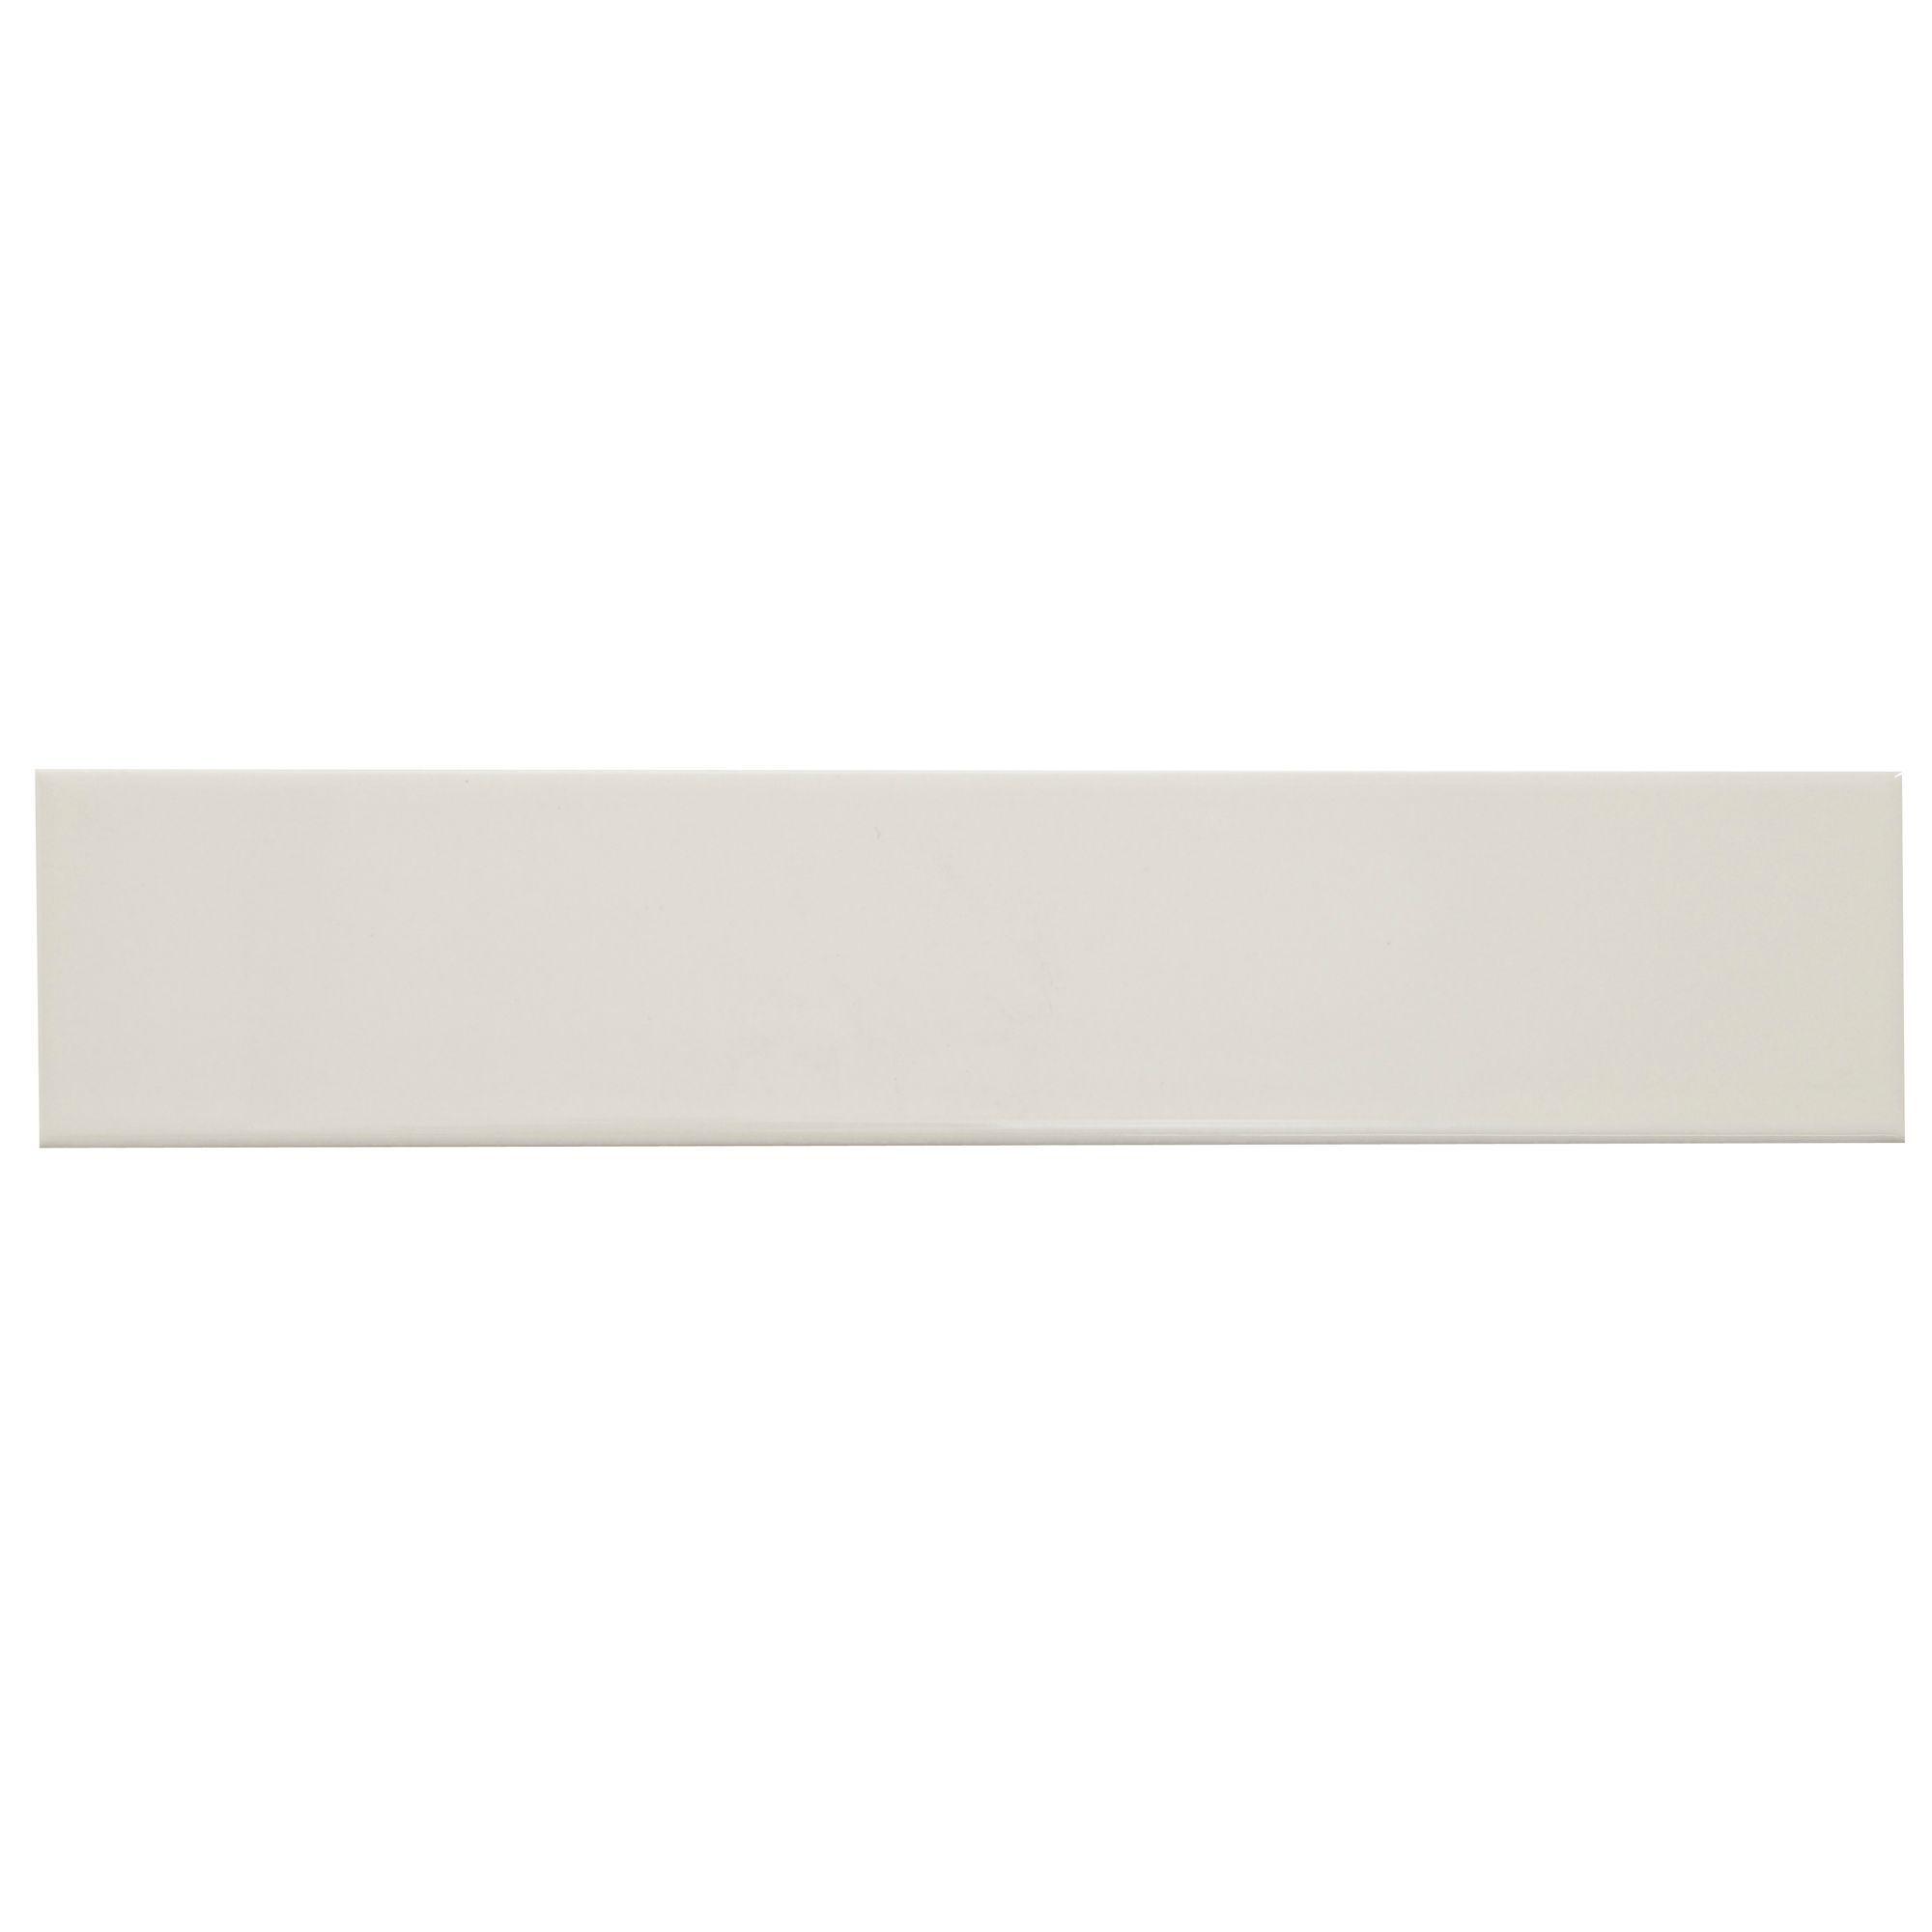 Levanto White Ceramic Wall Tile Pack Of 10 L 250mm W: Padstow Cream Ceramic Wall Tile, Pack Of 44, (L)150mm (W